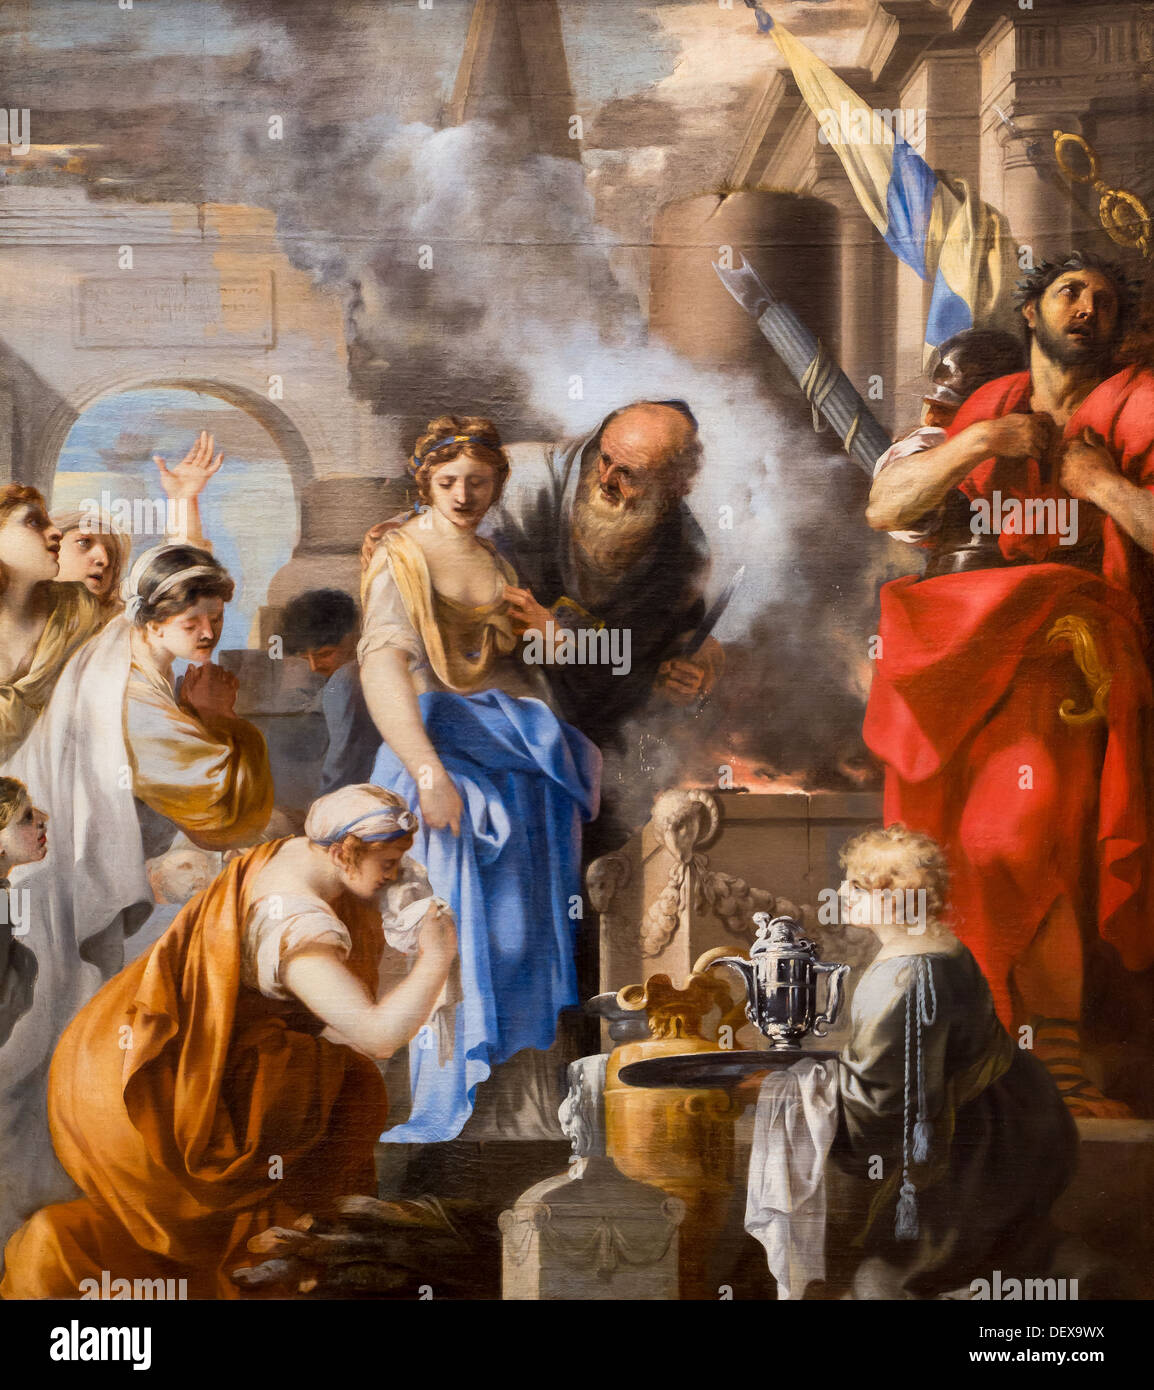 17th century  -  The sacrifice of Jephthah's daughter, around 1660 - Sébastien Bourdon oil on canvas - Stock Image